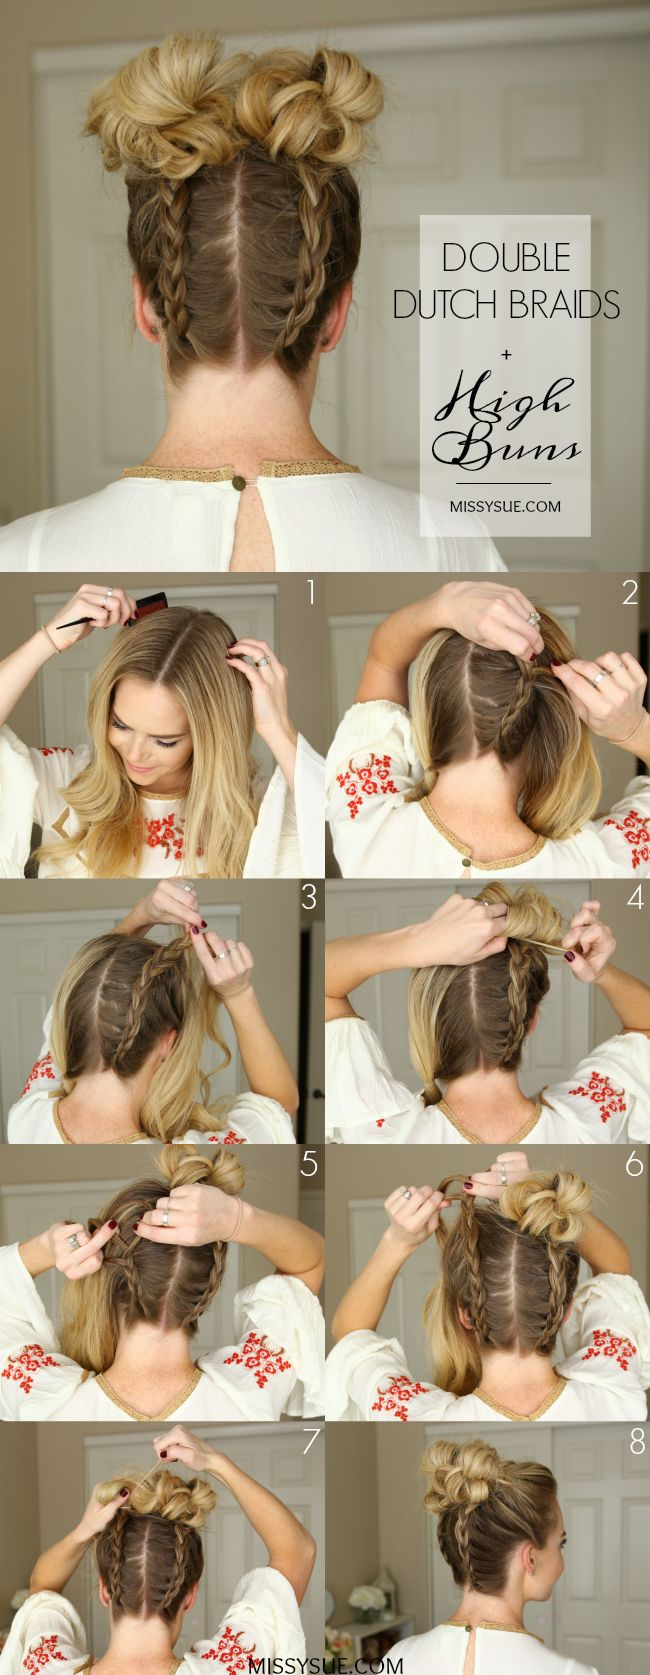 Double Dutch Braids High Buns | Missy Sue na Stylowi.pl